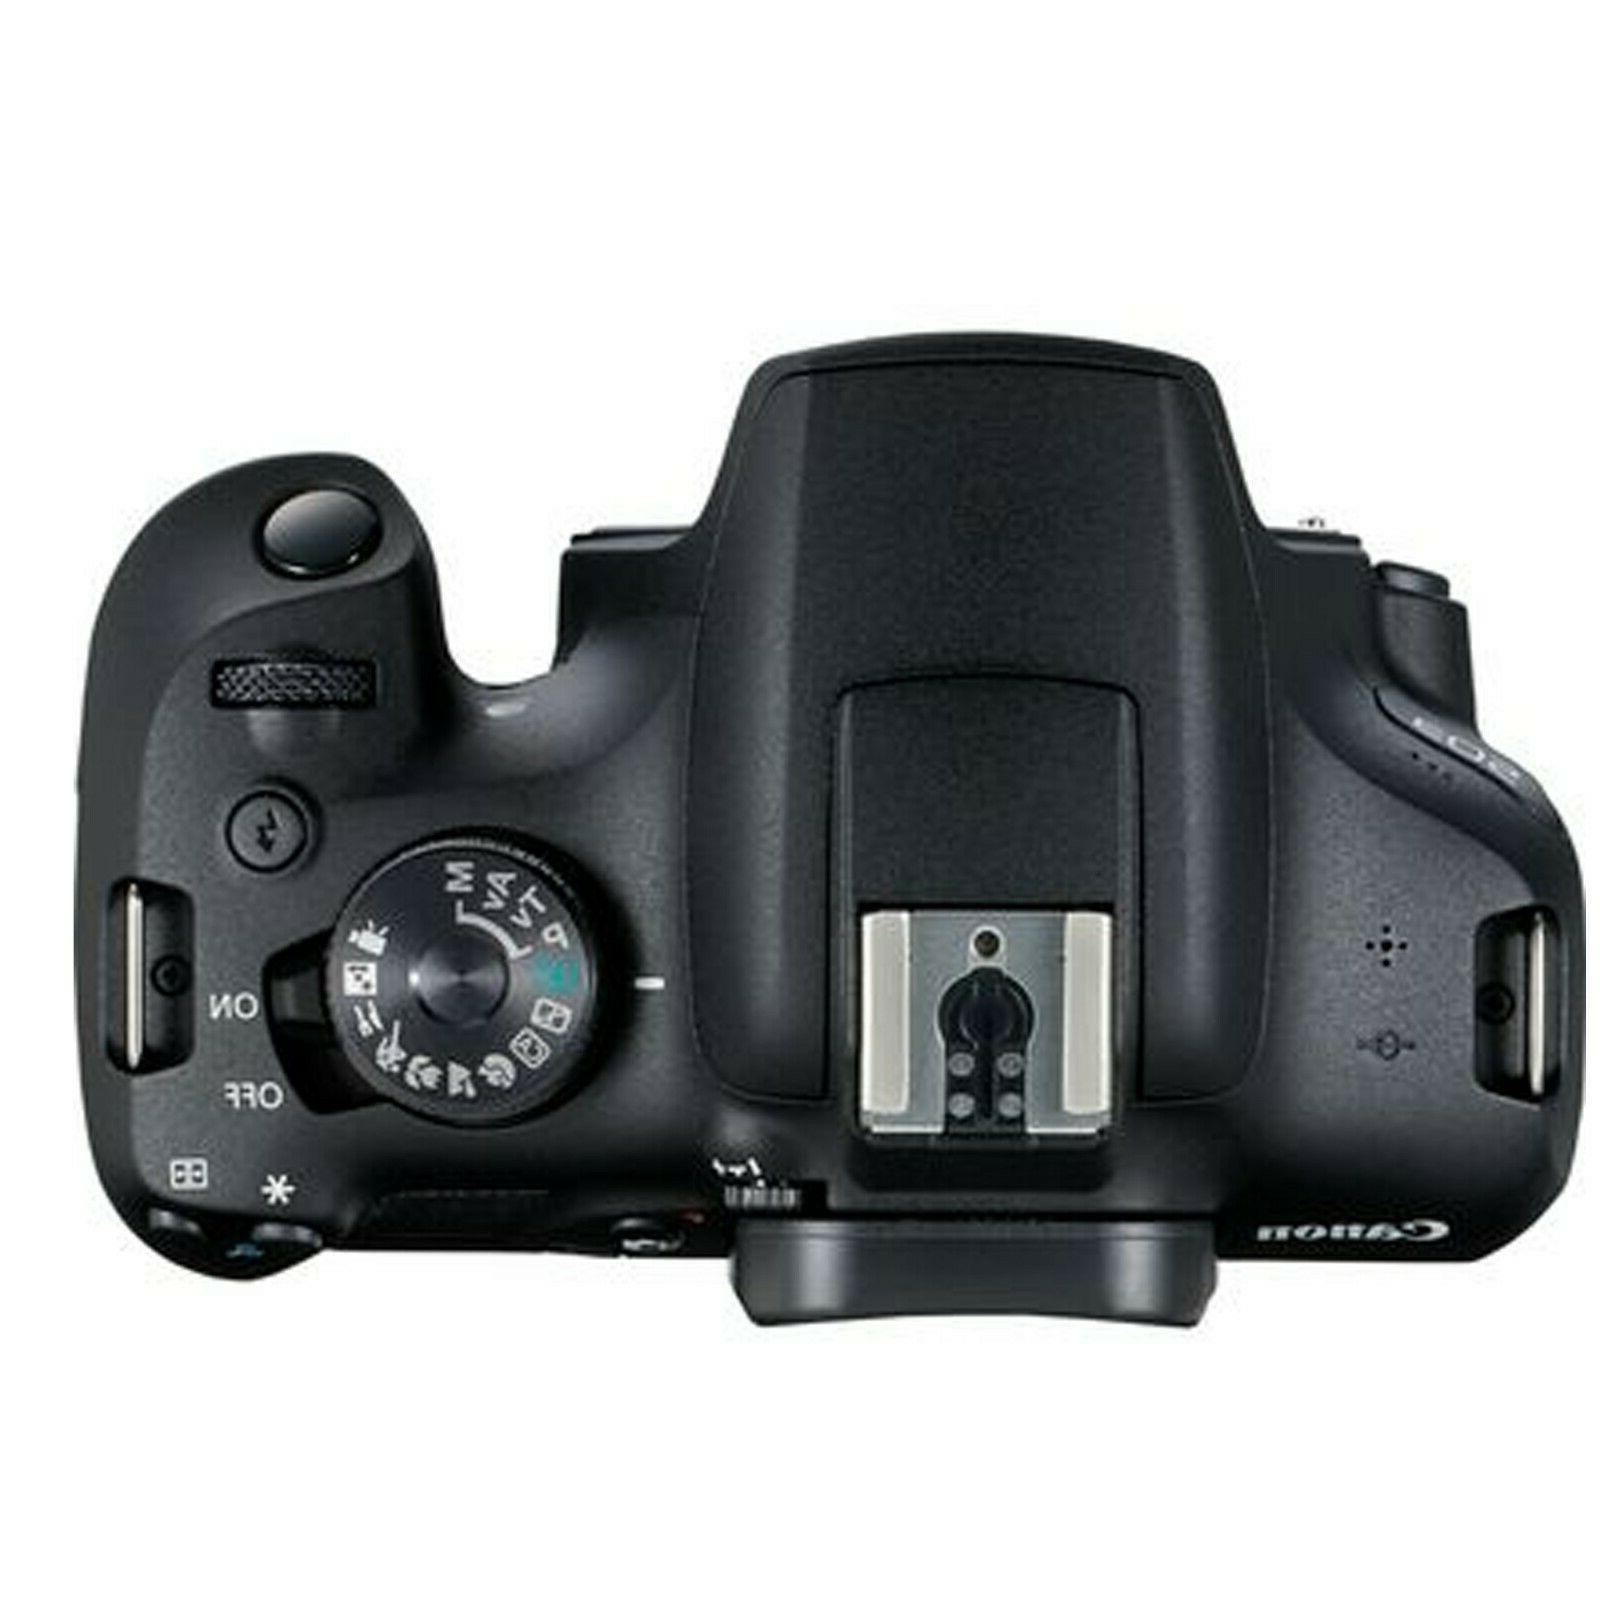 Canon EOS 2000D / Rebel + EF-S Lens+ 128GB Bundle +More